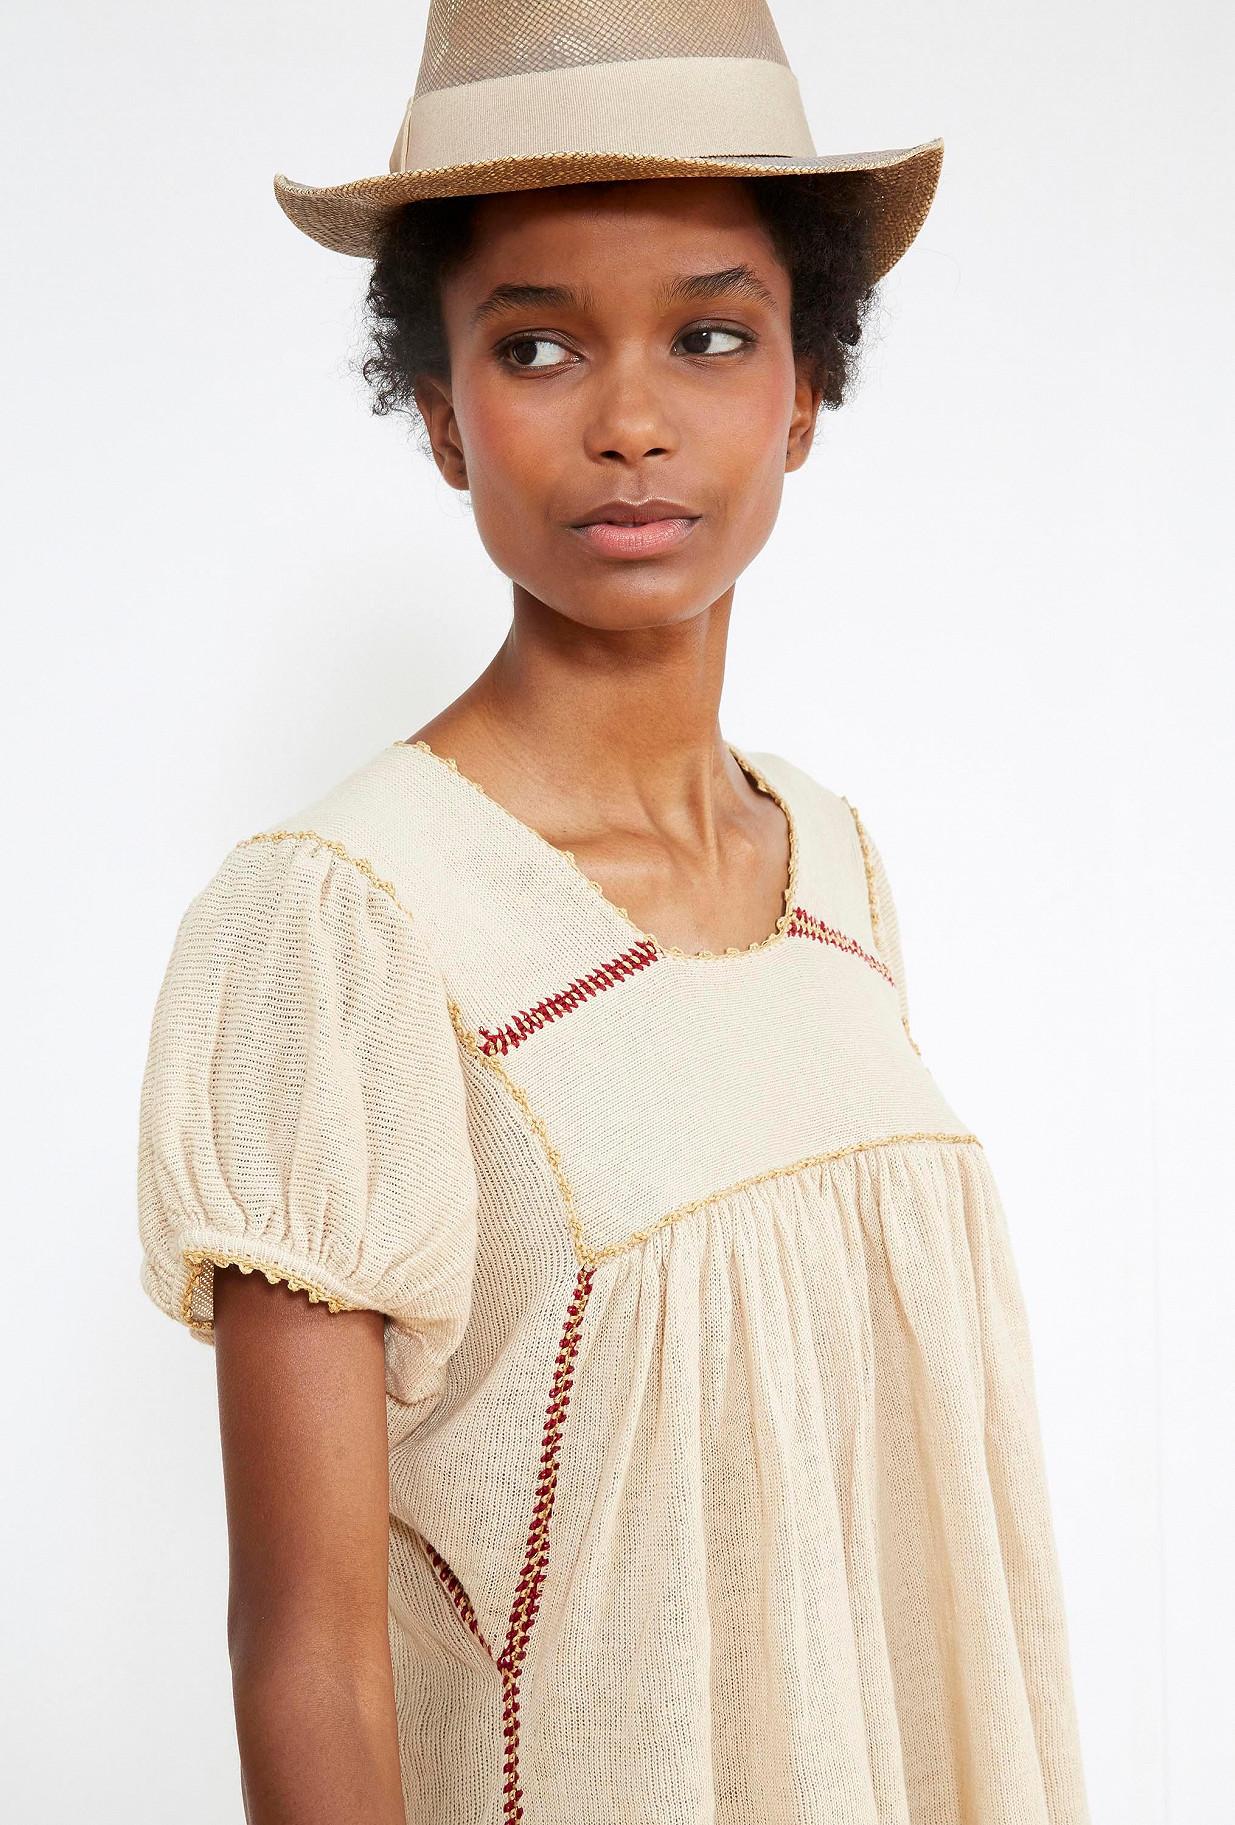 clothes store TOP  Tiquita french designer fashion Paris